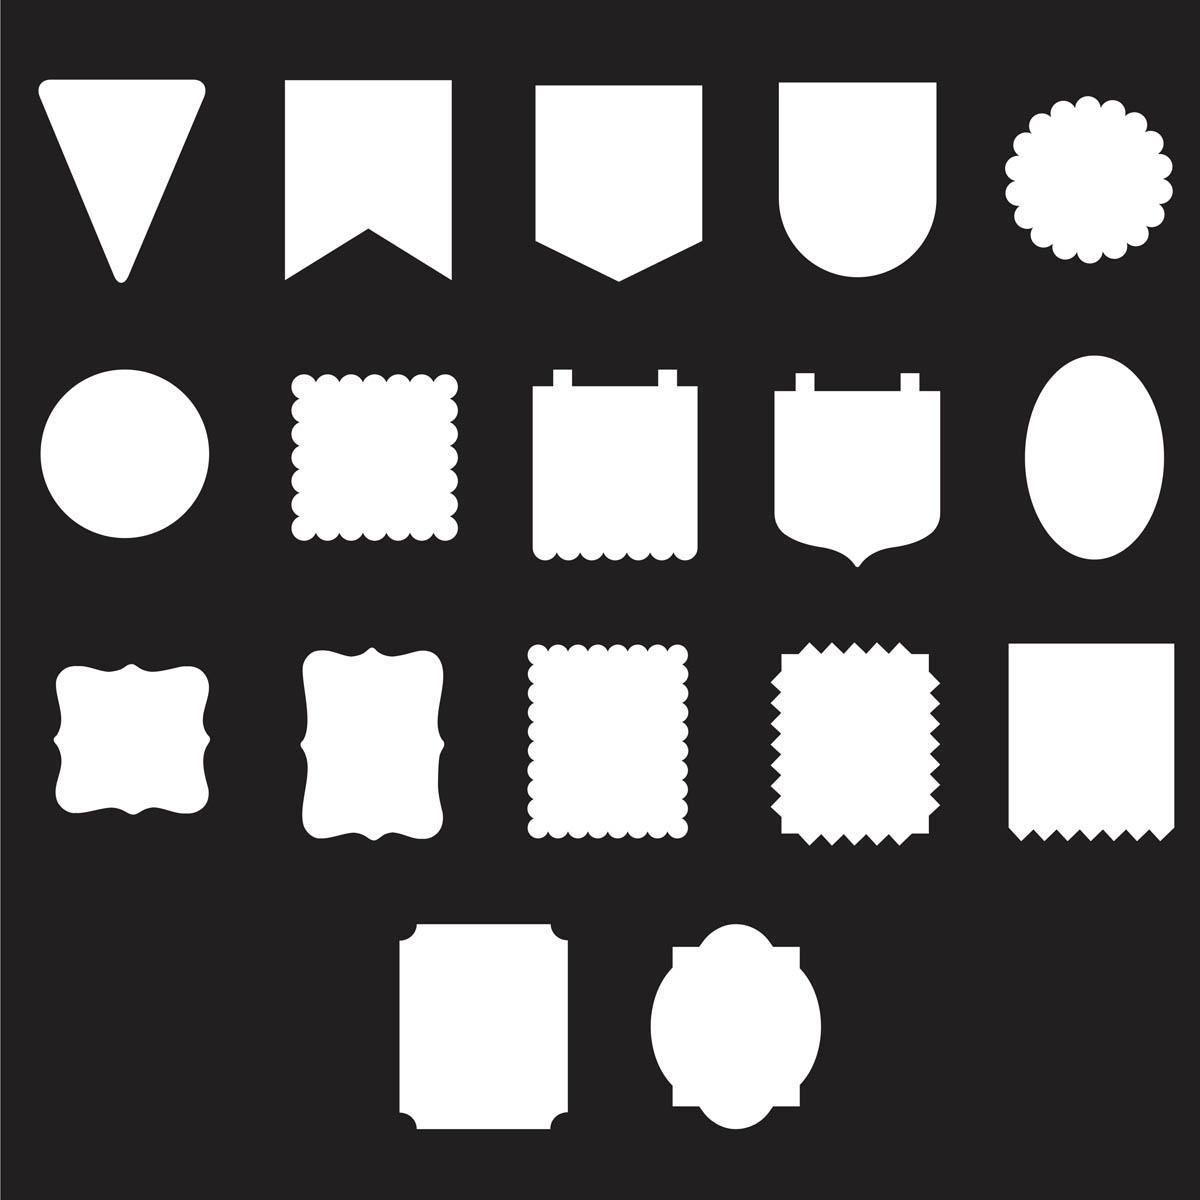 FolkArt ® Alphabet & Monogram Paper Stencils - Pennant Shapes